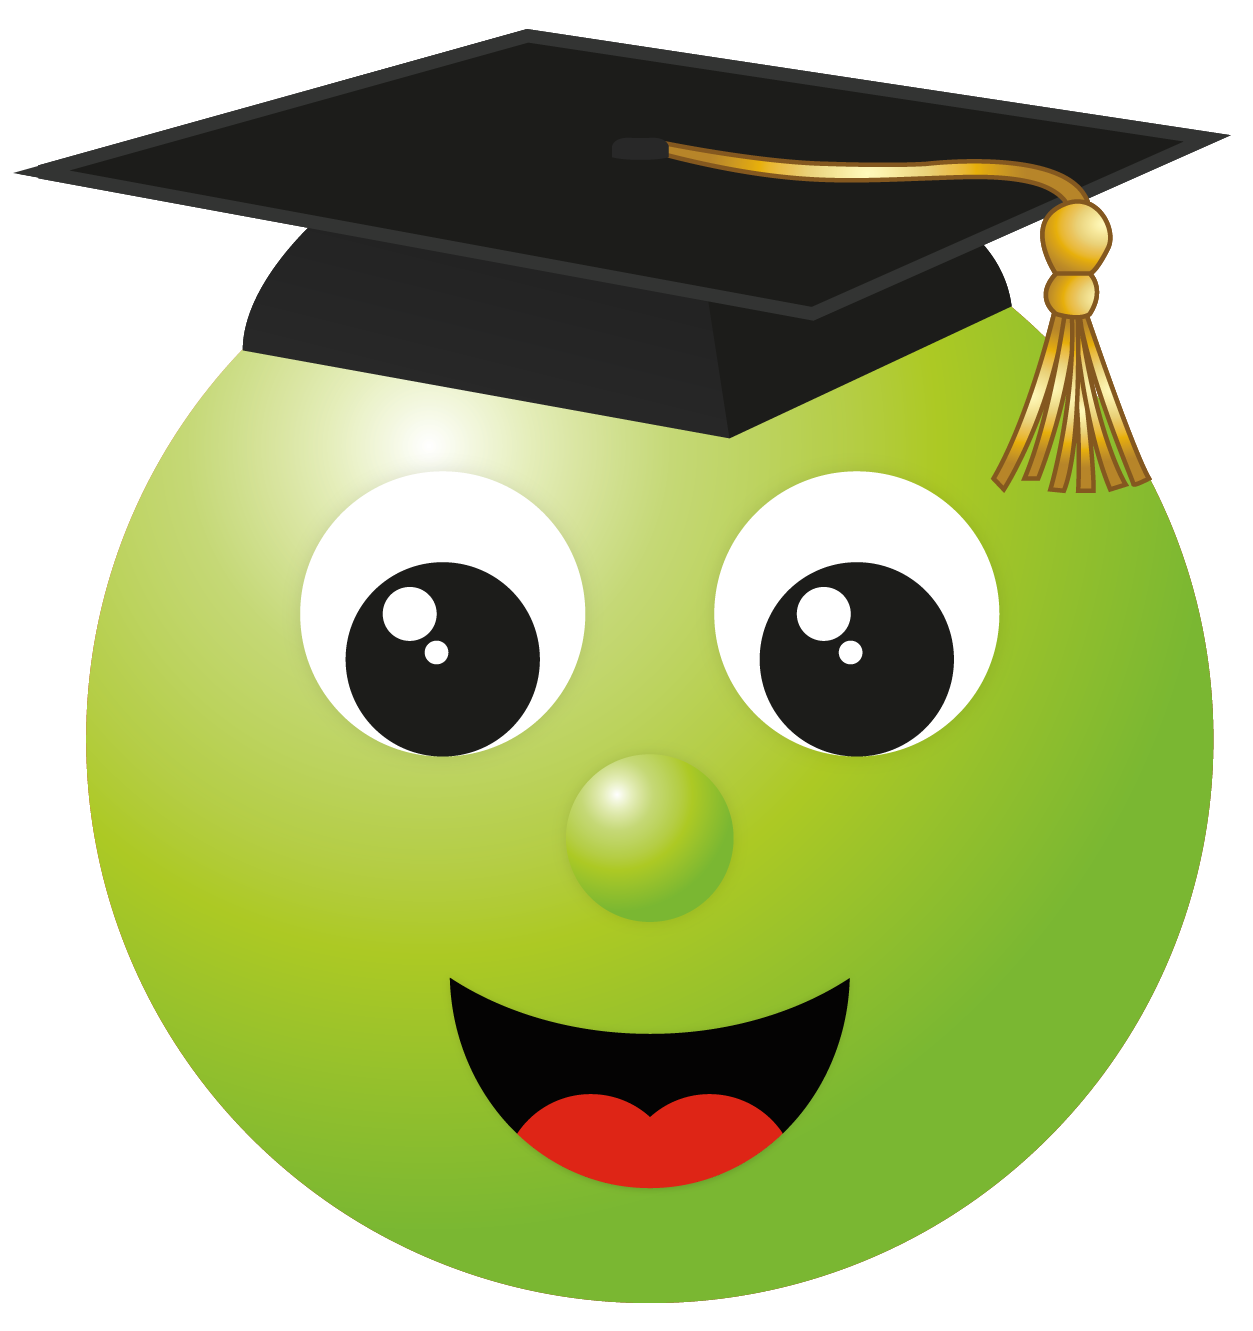 caritas emoticon pinterest. Smiley clipart graduation